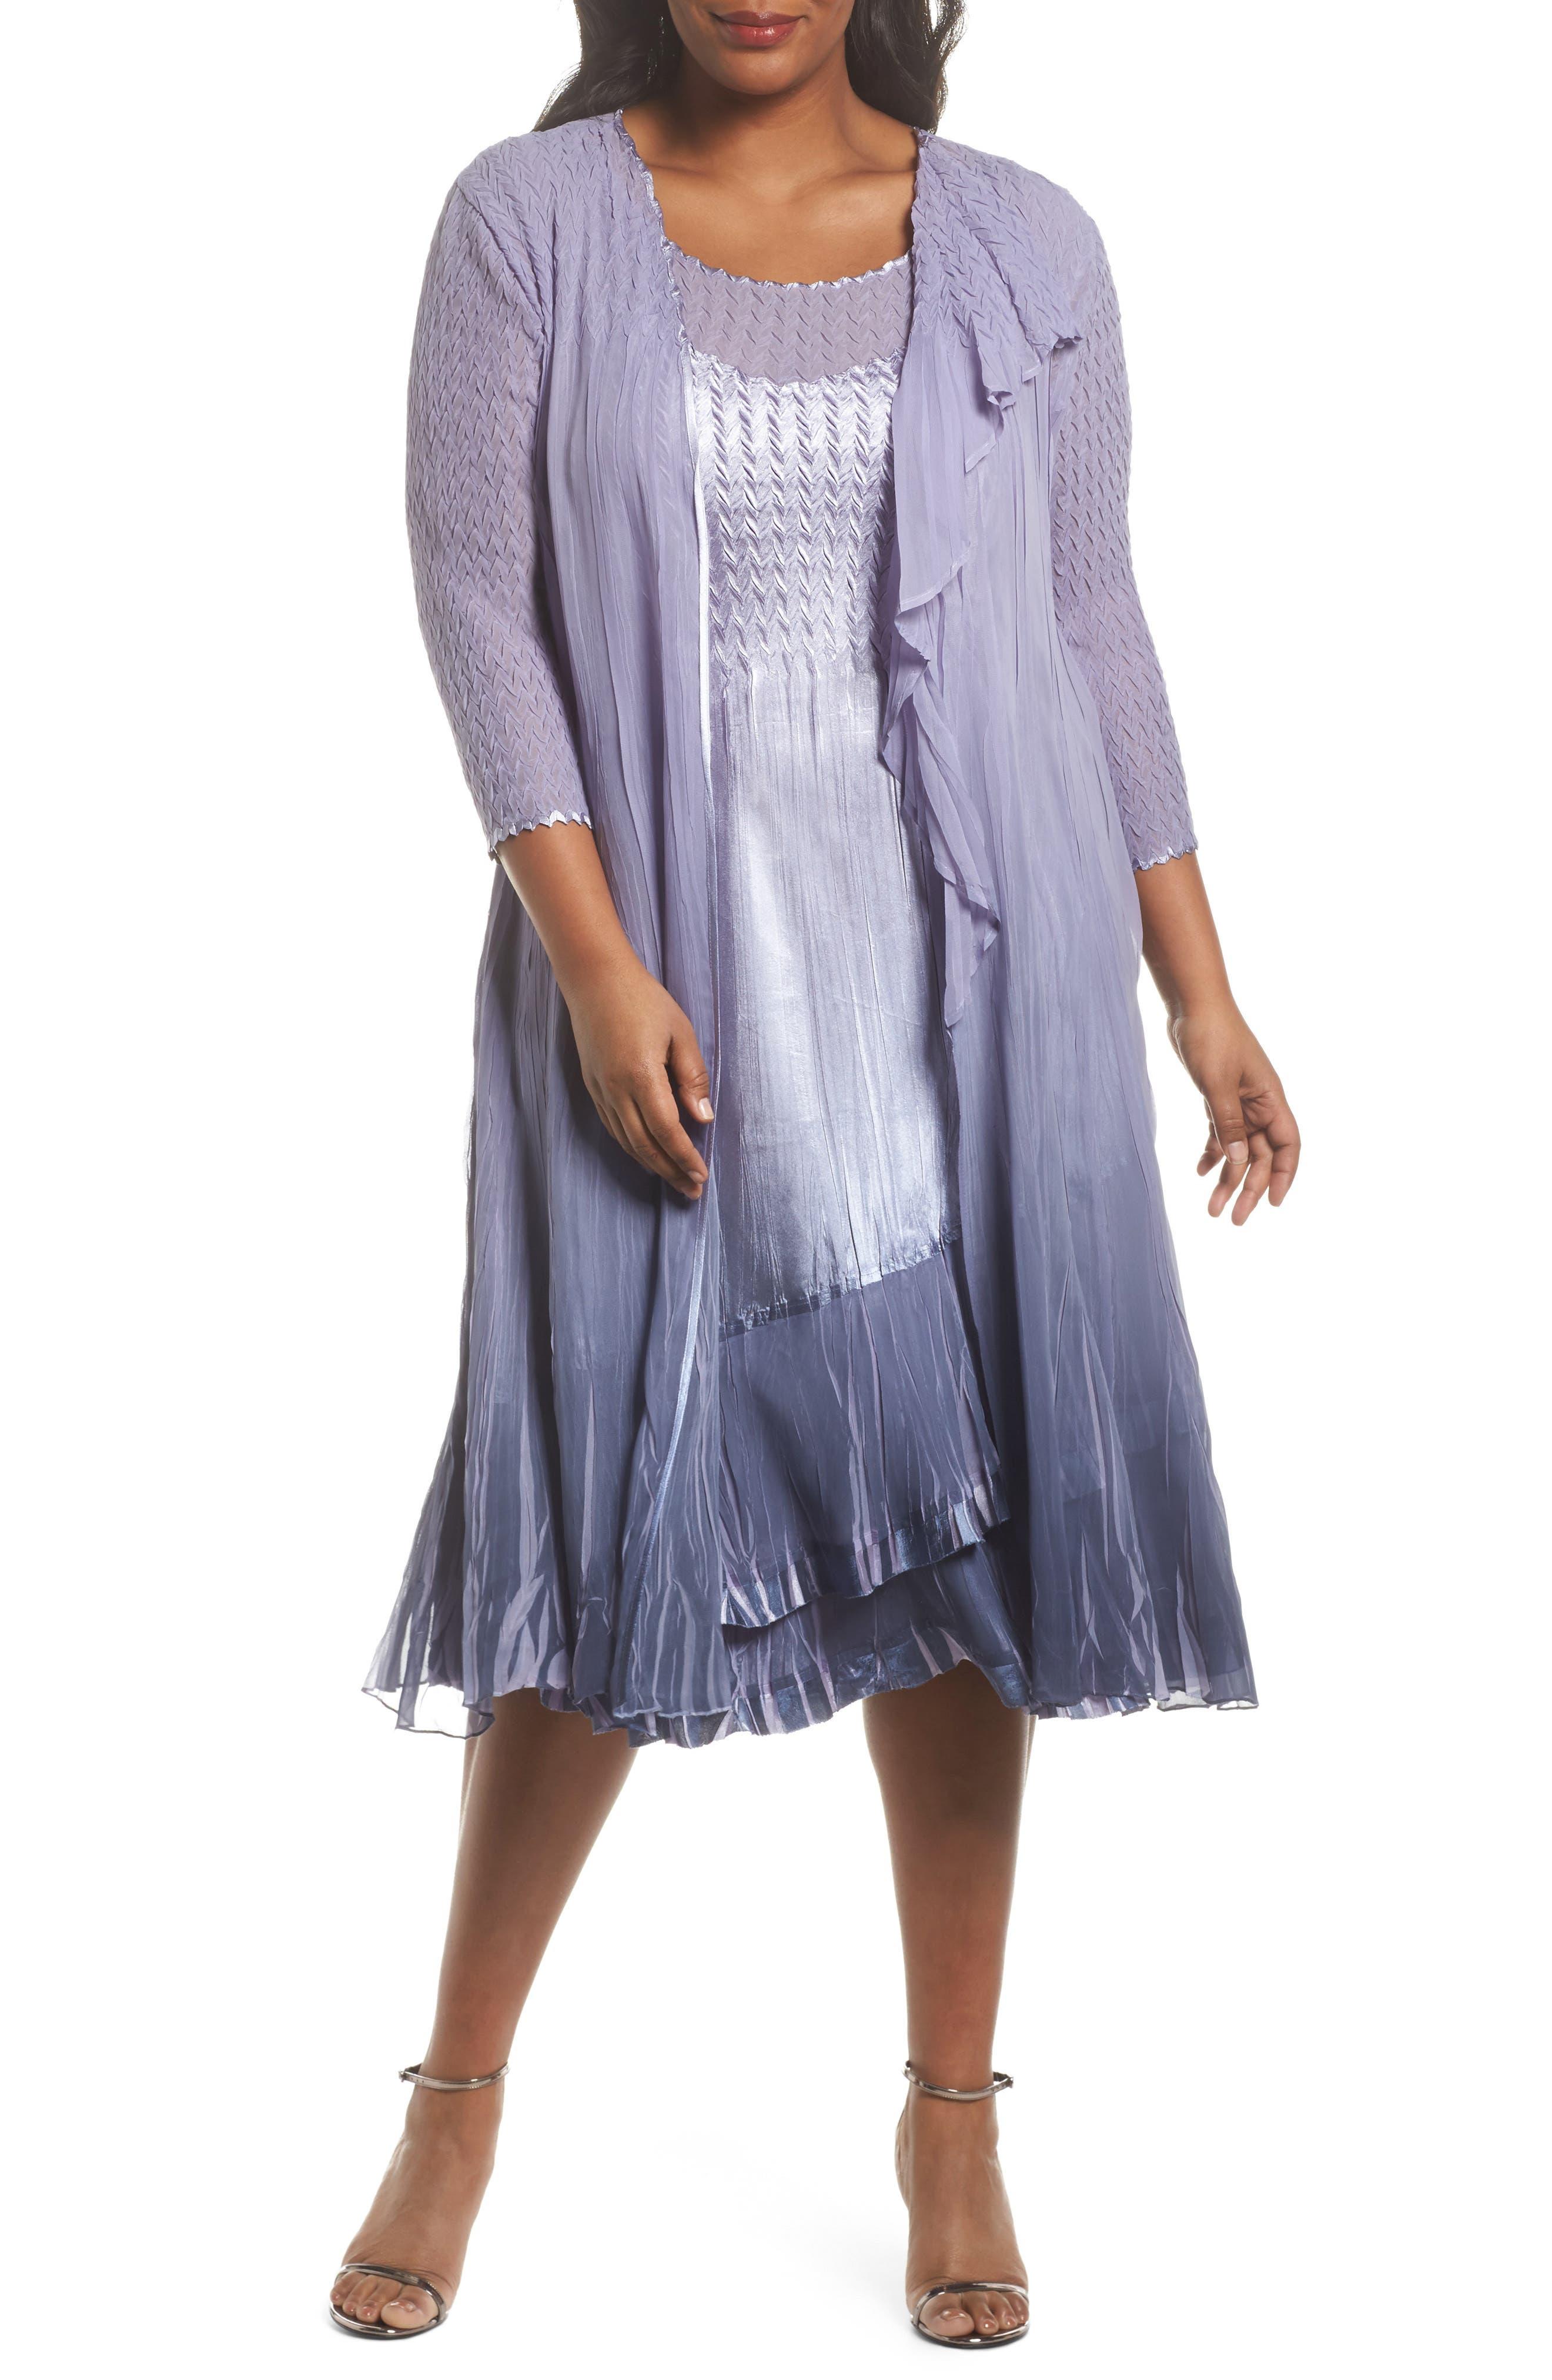 Main Image - Komarov Charmeuse Dress & Waterfall Jacket Set (Plus Size)